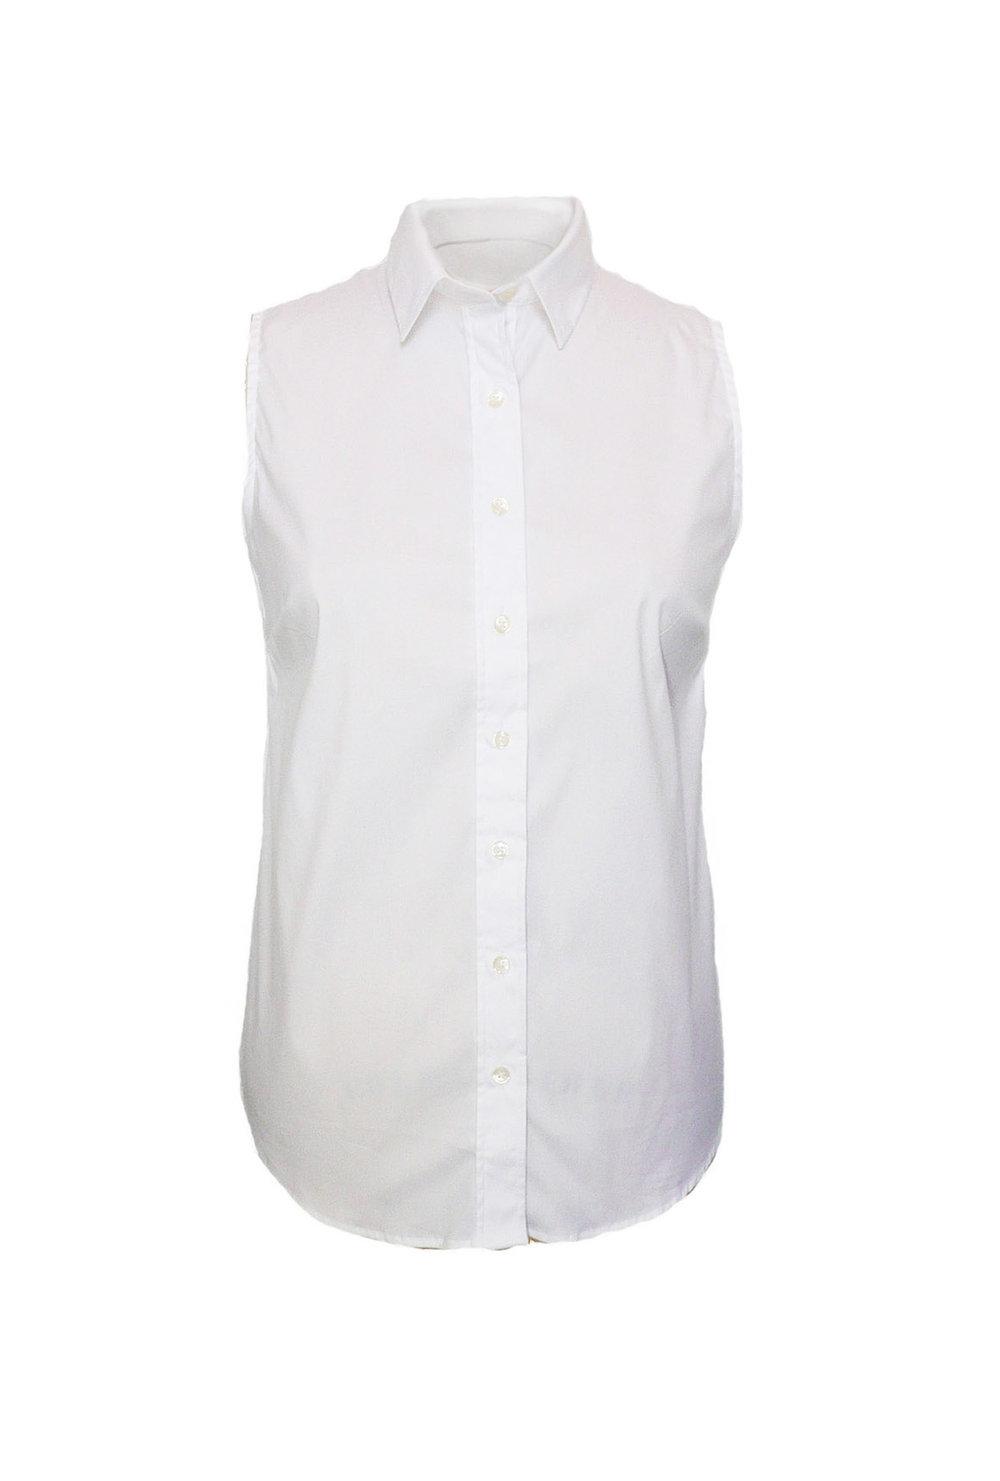 bls sleeveless cotton.jpg